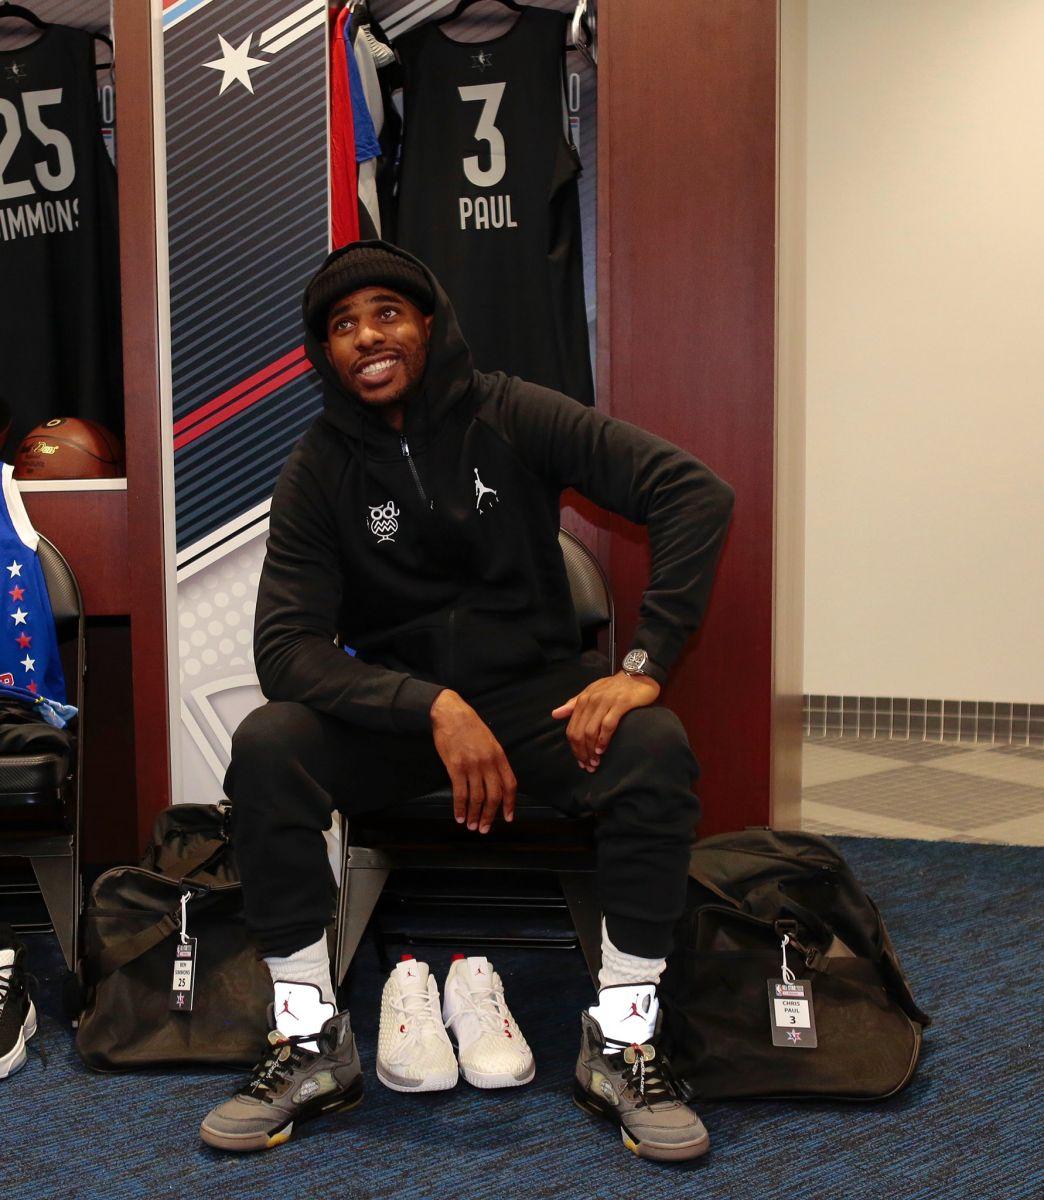 NBA官方发布詹姆斯和保罗今日全明星训练前更衣室照